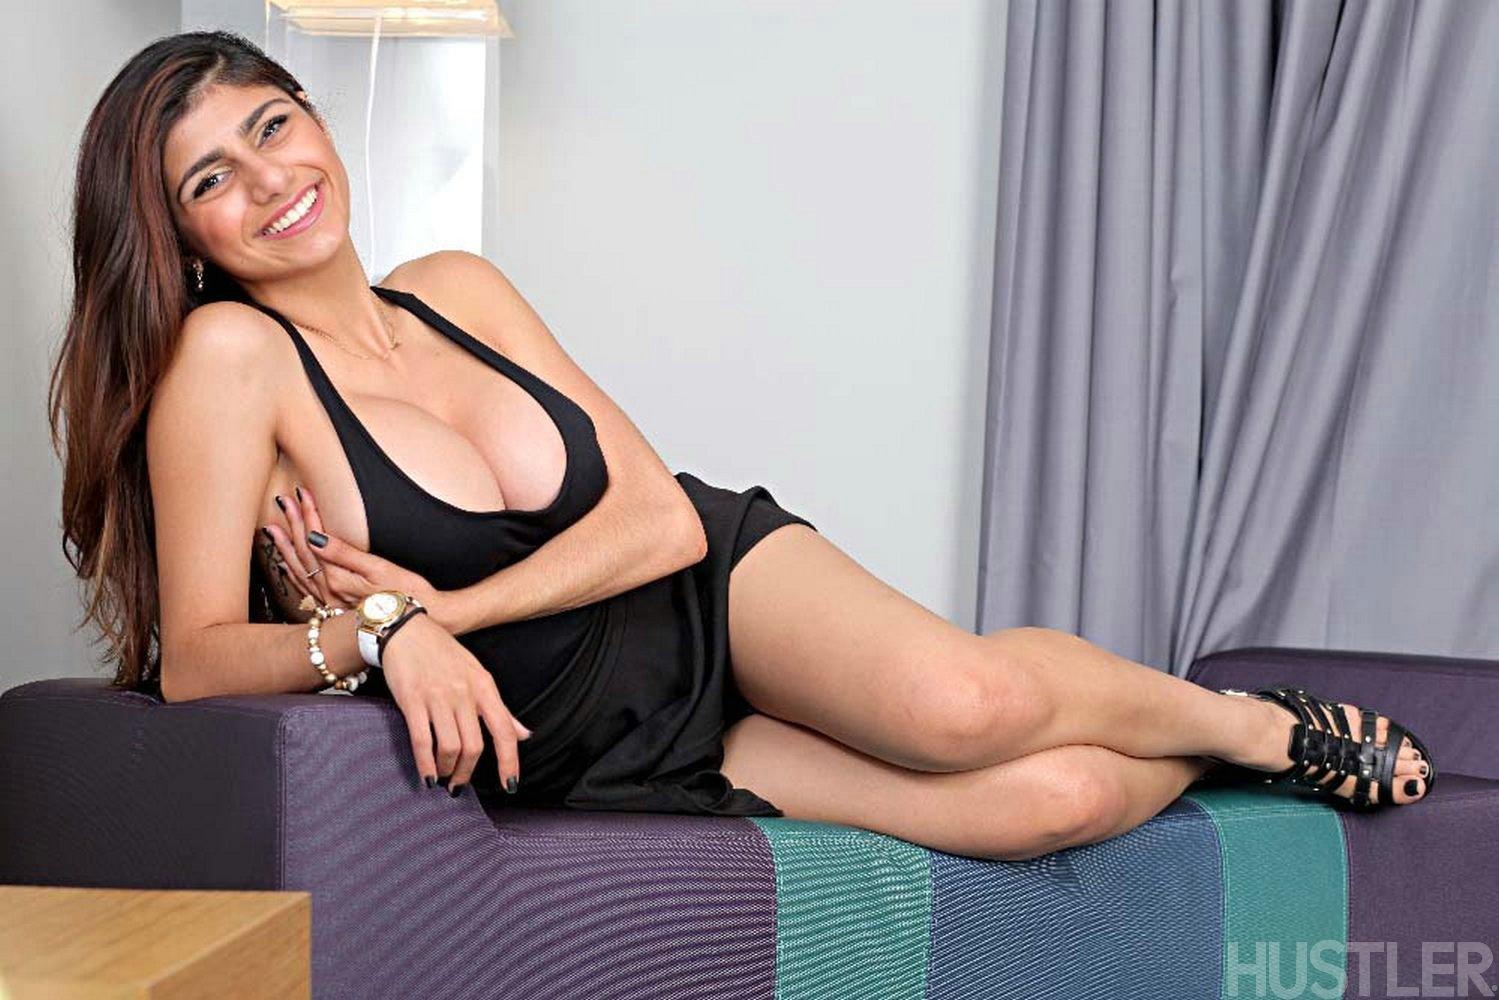 Pussy sexy black porn stars girls girls tongue kissing